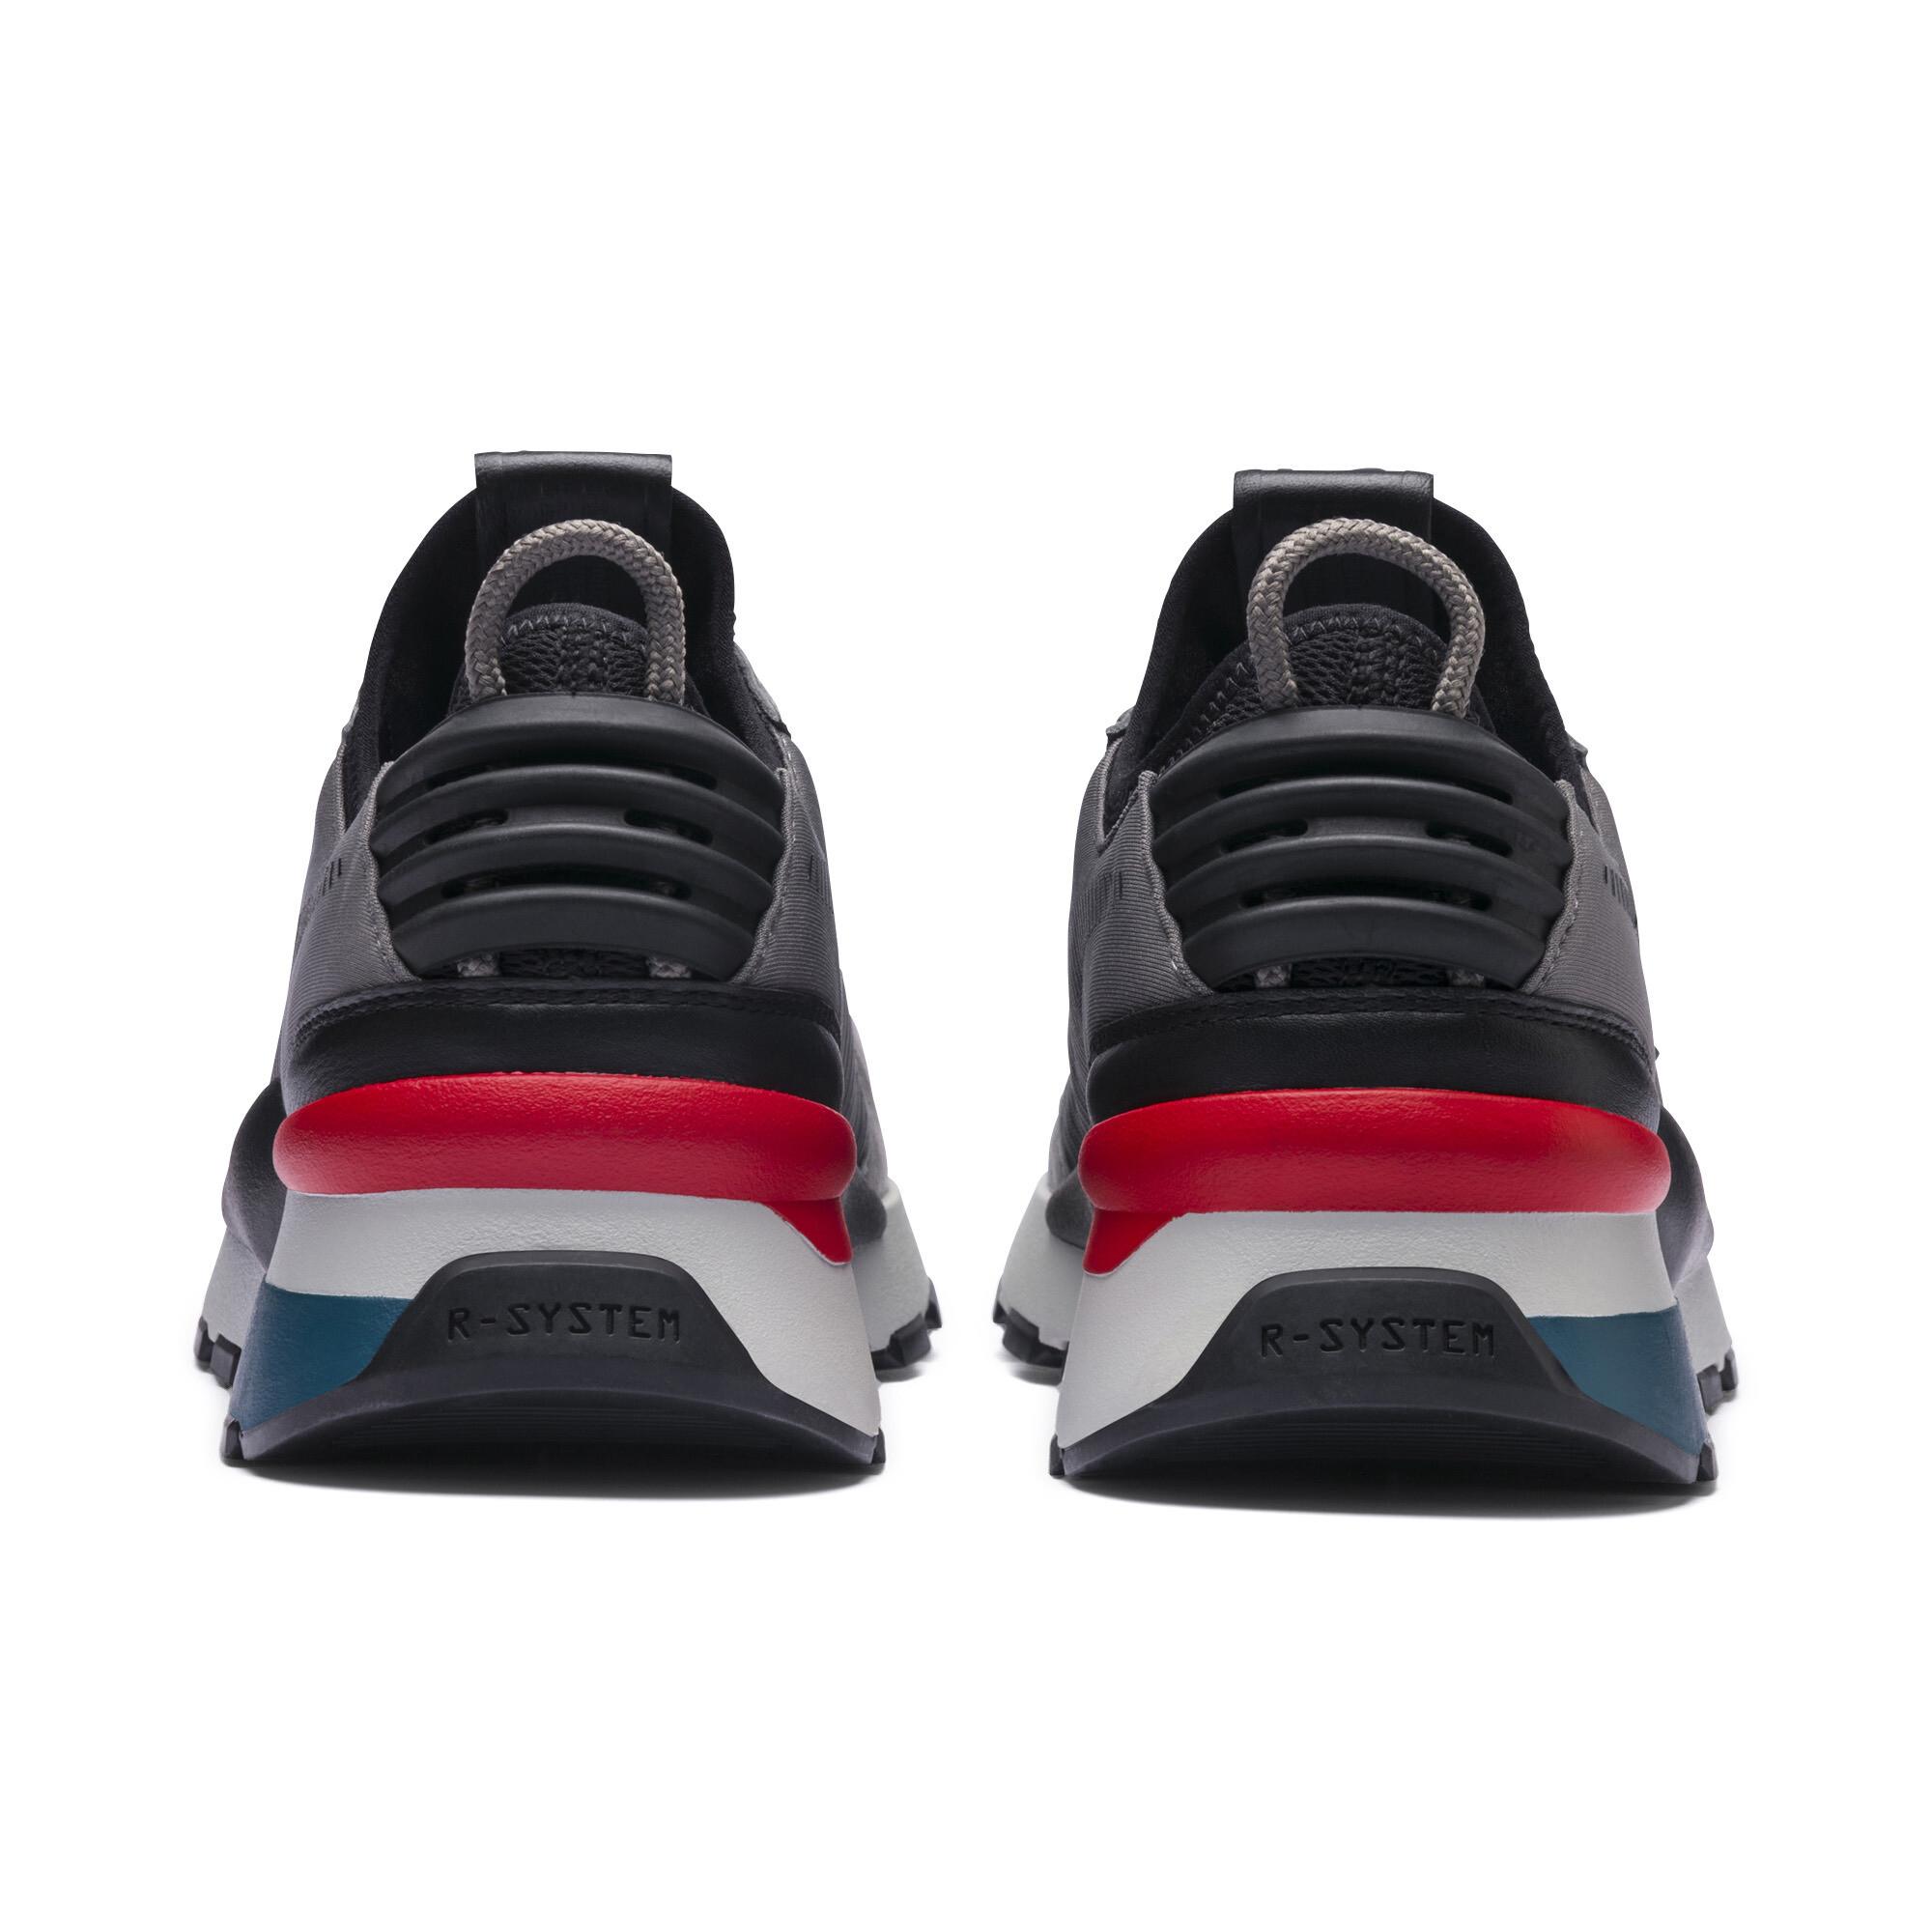 PUMA-RS-0-Tracks-Unisex-Shoe-Evolution thumbnail 16